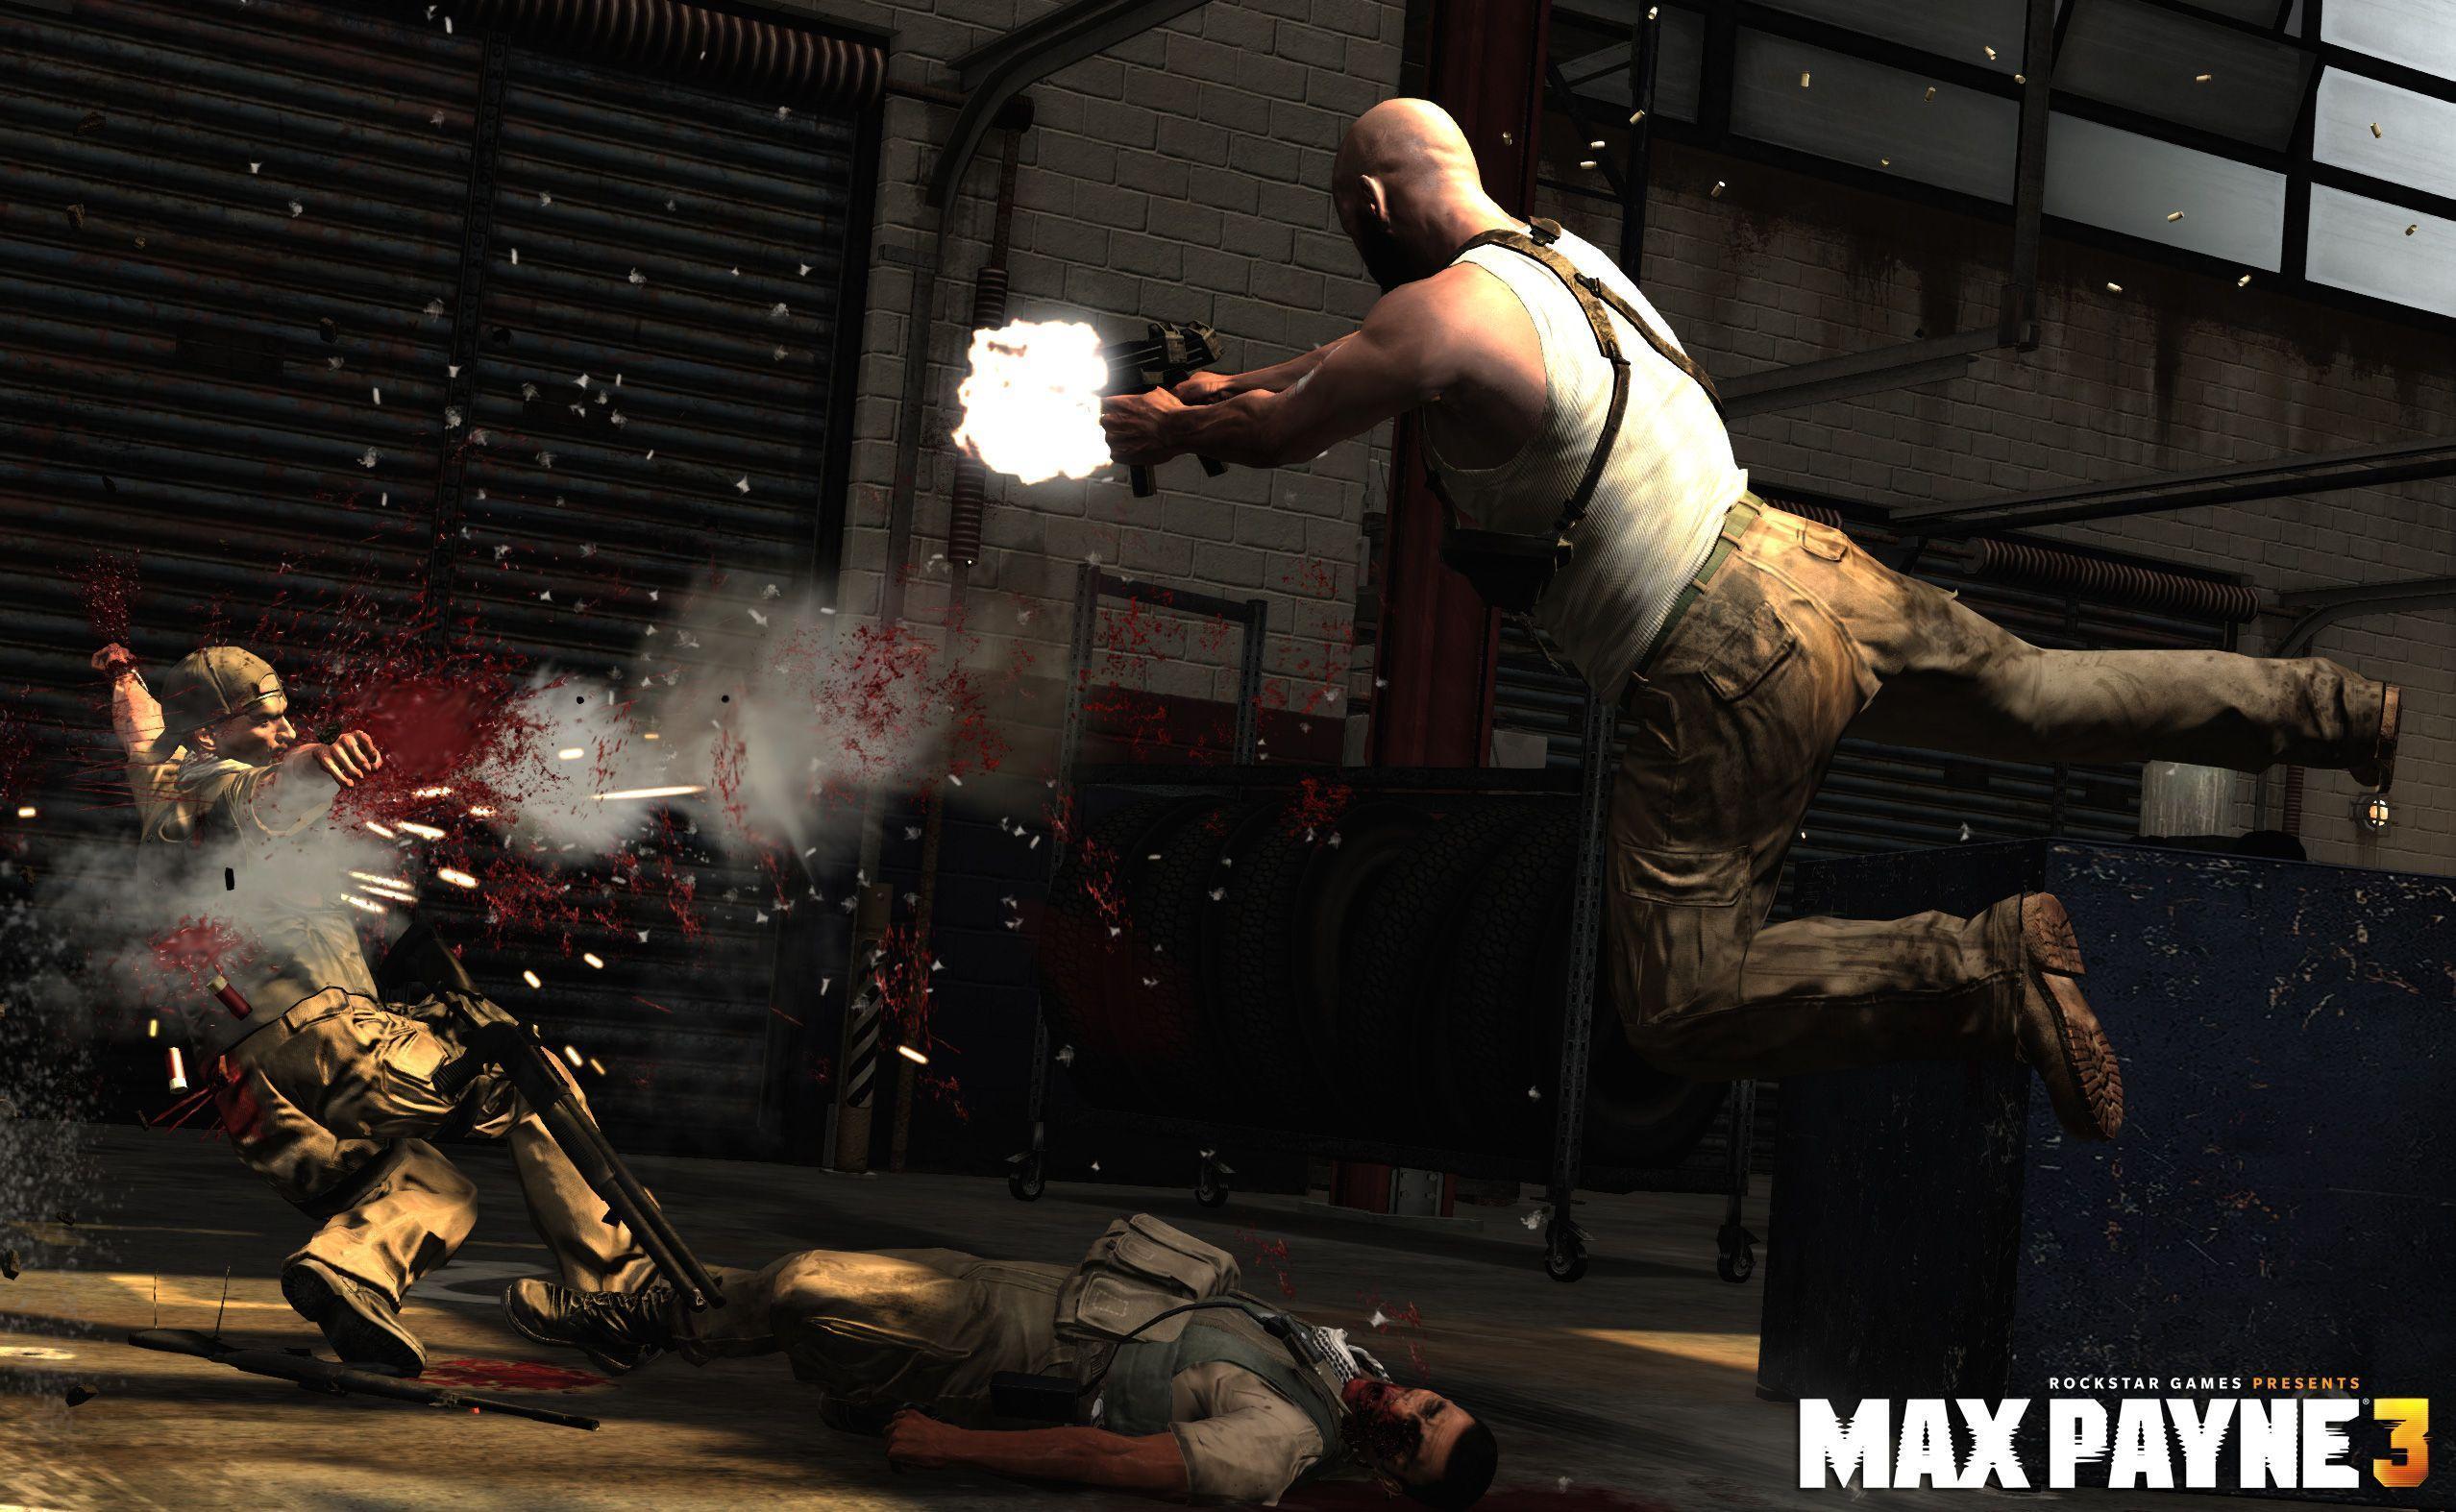 Max Payne 3 Wallpapers Wallpaper Cave